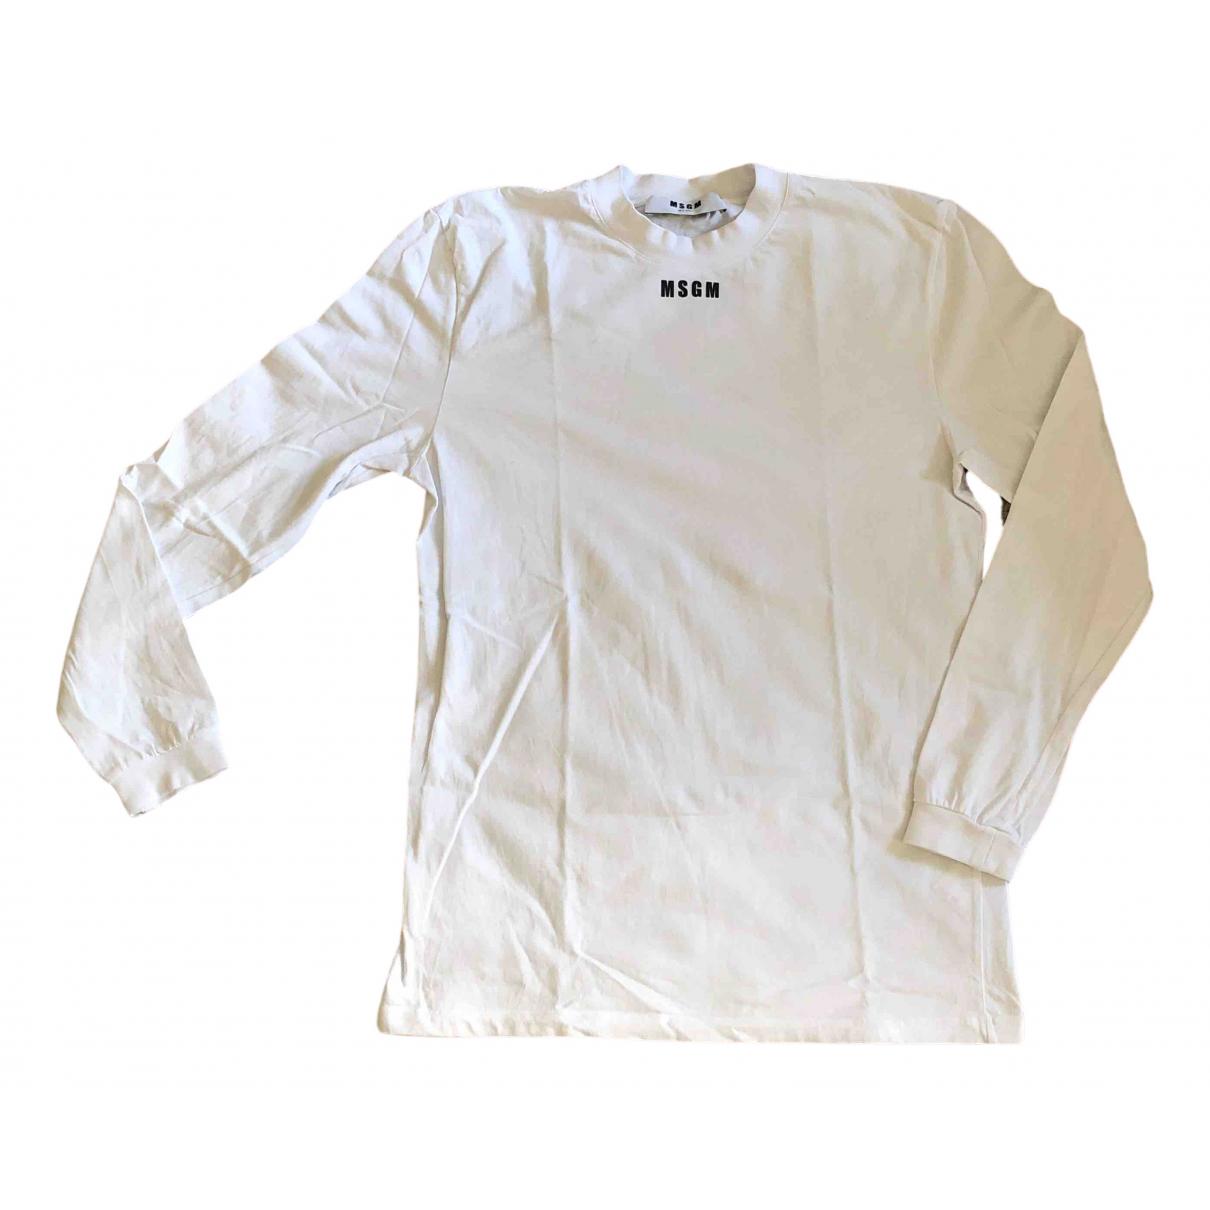 Msgm \N White Cotton Knitwear & Sweatshirts for Men XS International